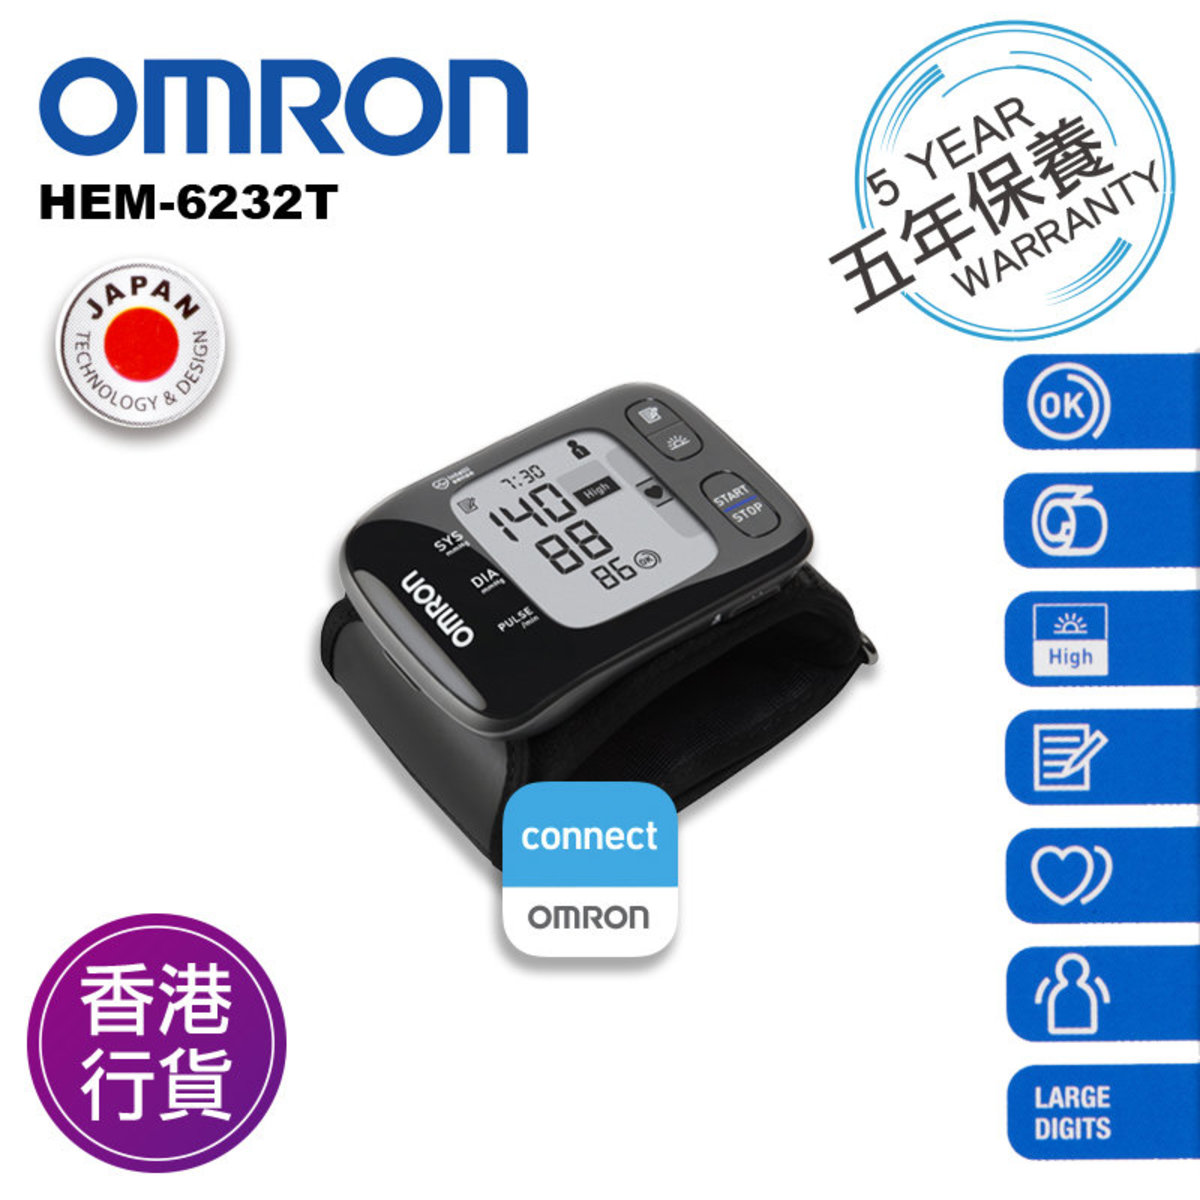 HEM-6232T Wrist Blood Pressure Monitor  Five Year Warranty